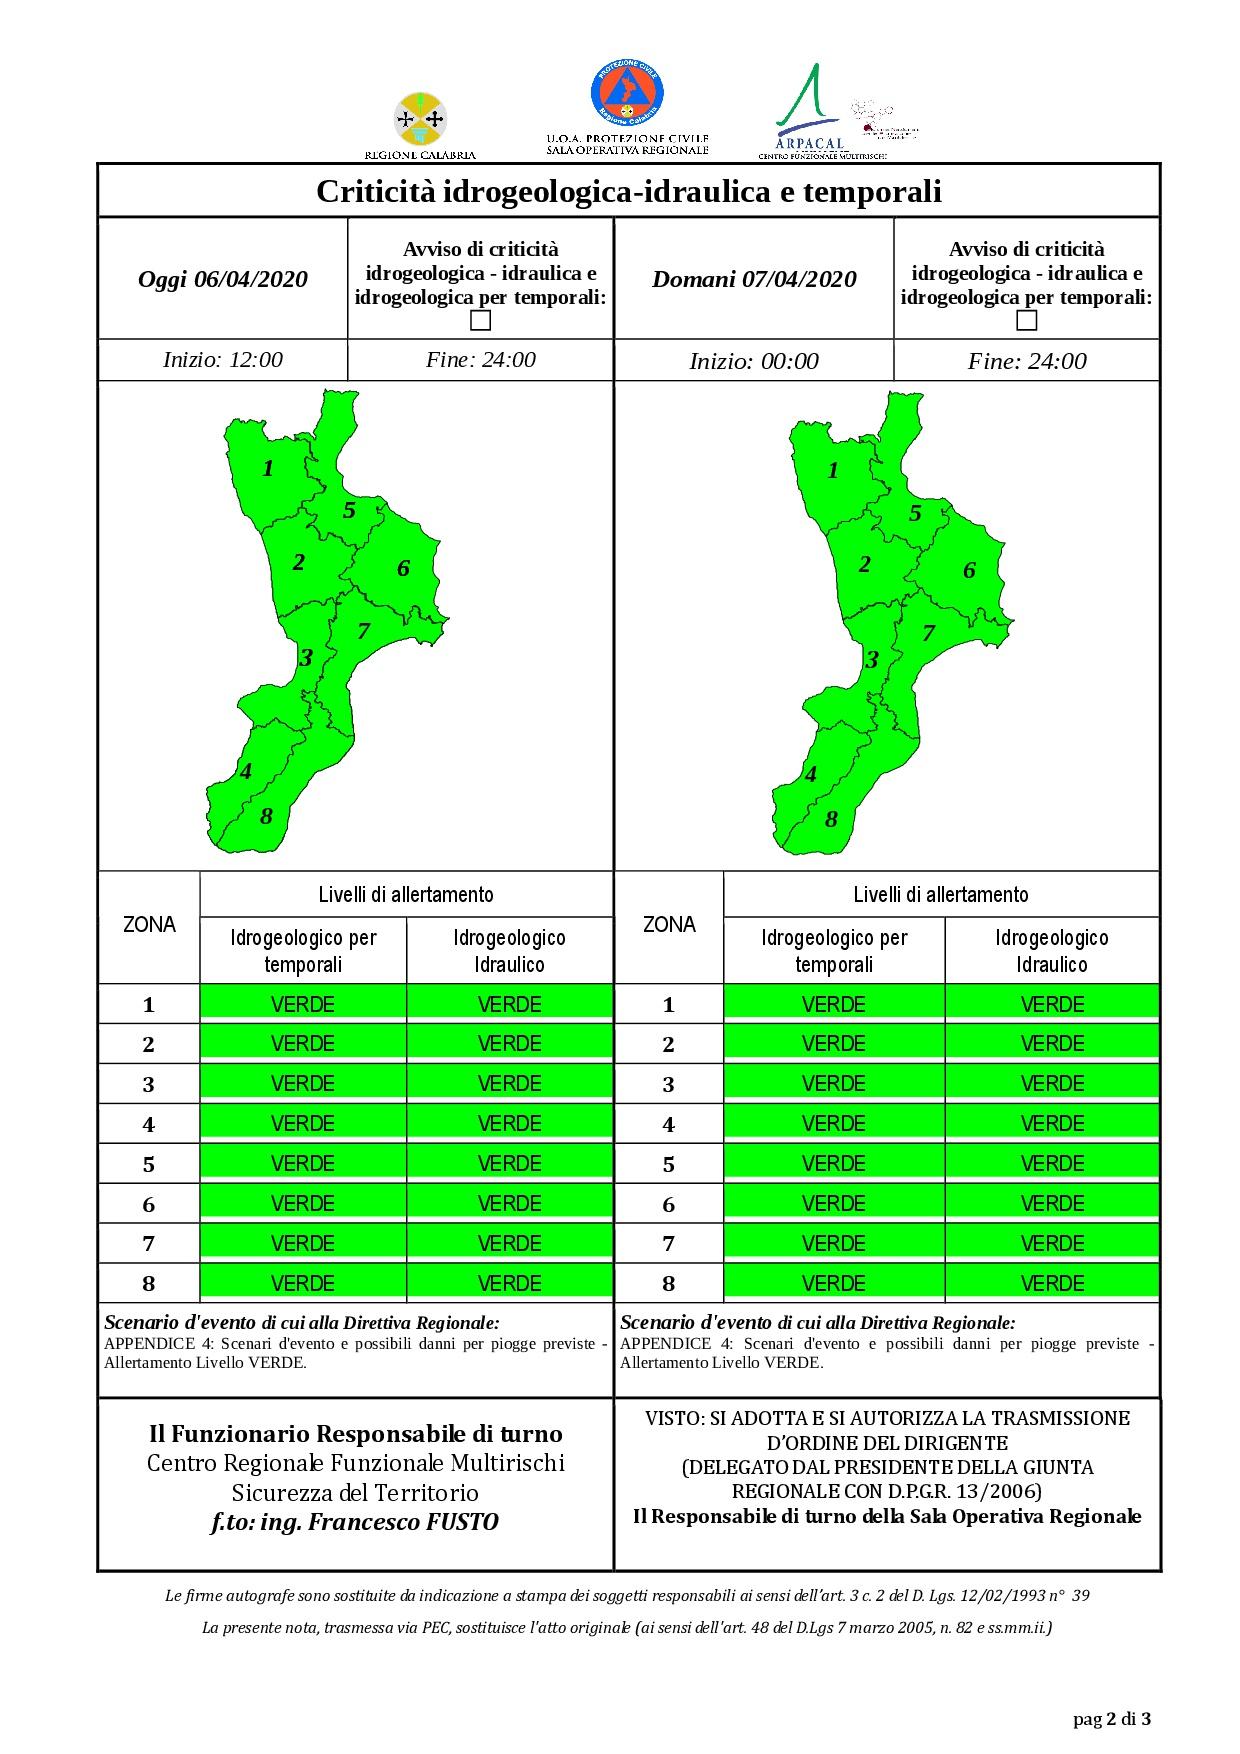 Criticità idrogeologica-idraulica e temporali in Calabria 06-04-2020